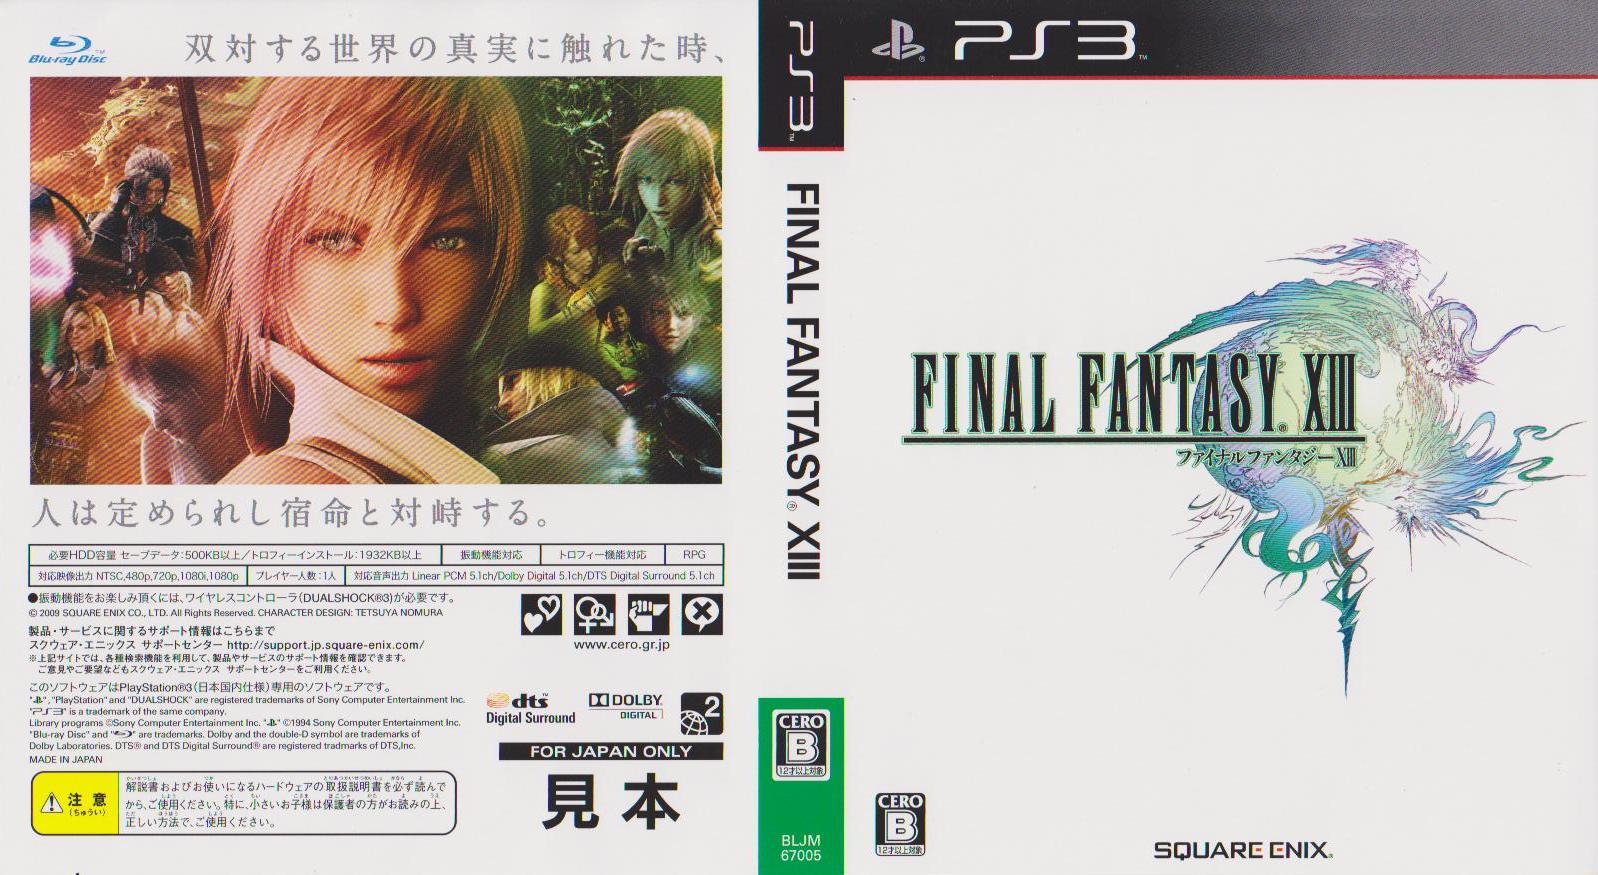 Final-Fantasy-XIII-Box-Art-Scan_01